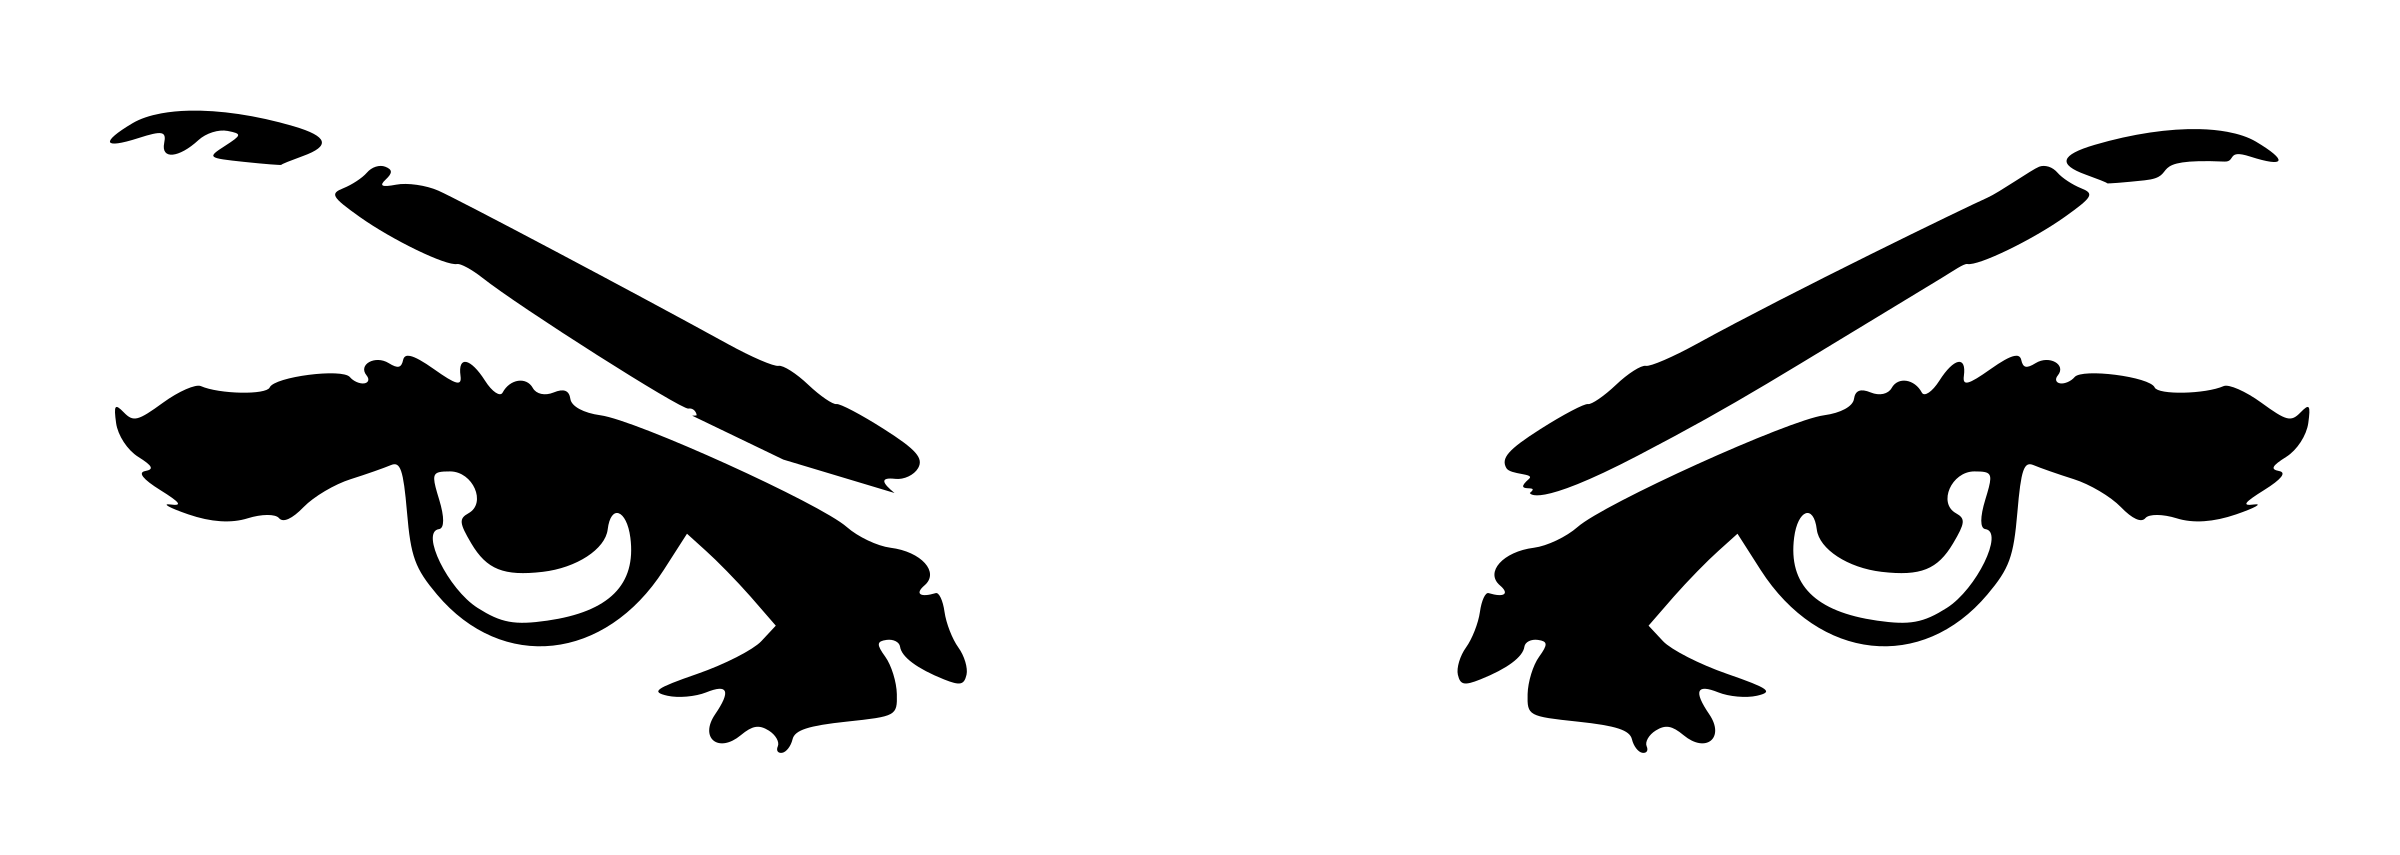 2400x855 Clipart